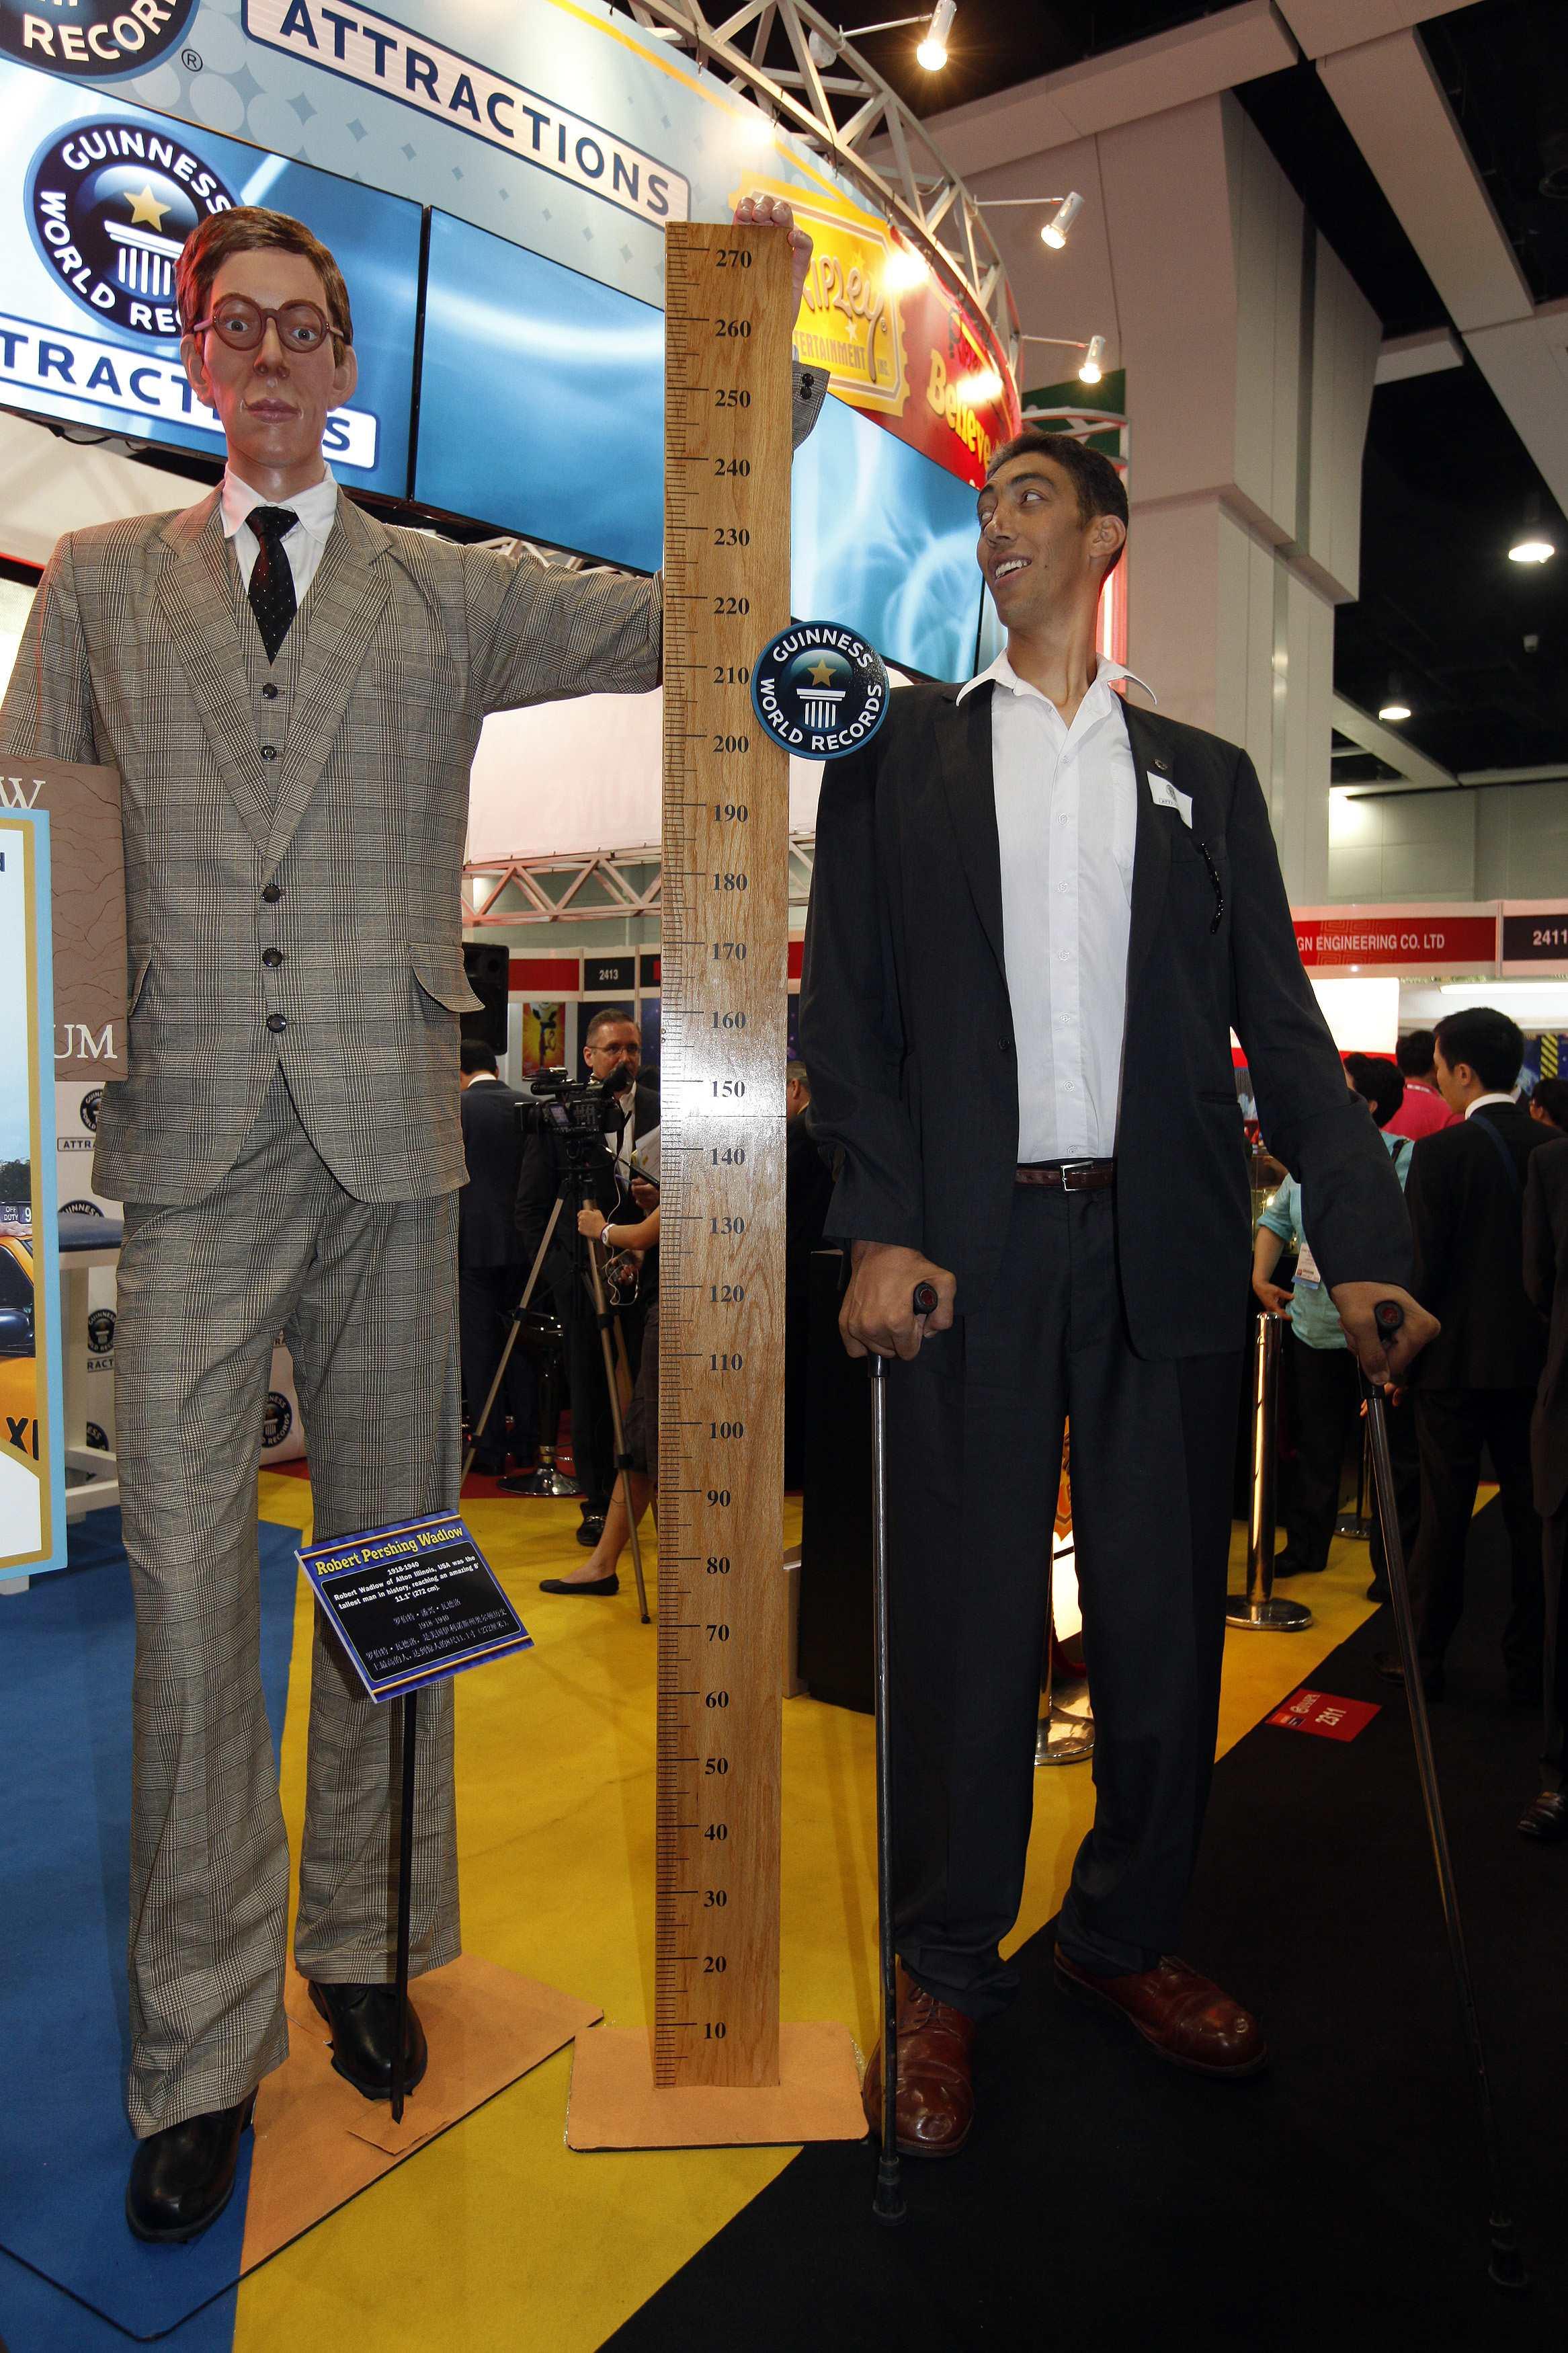 ¿Cuánto mide Sultan Kösen? - Altura - Real height 2012-06-06T063911Z_311127792_GM1E86614WN01_RTRMADP_3_HONGKONG